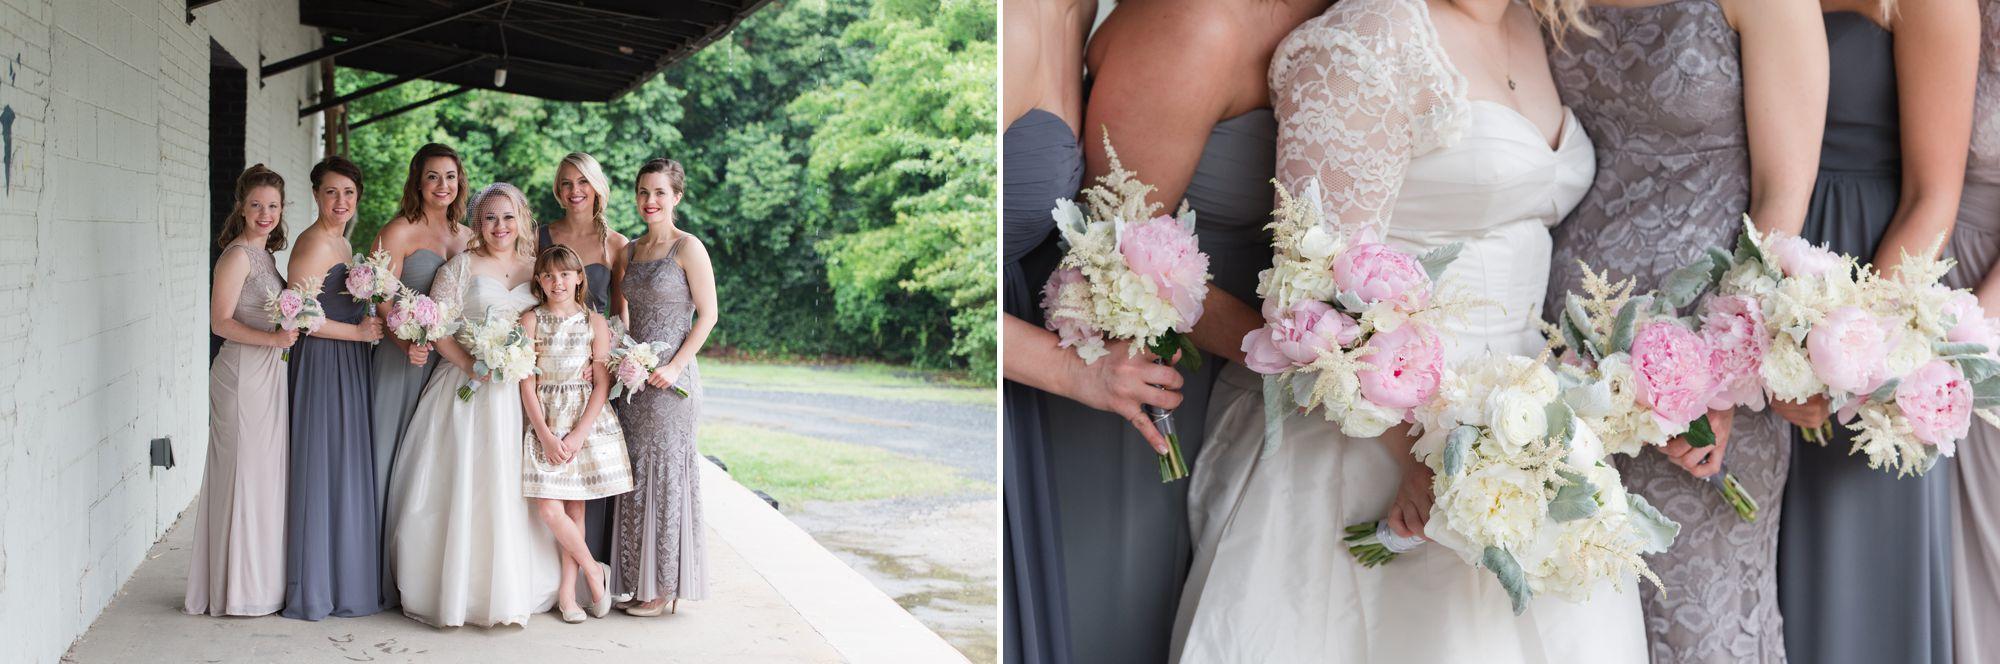 uptown-charlotte-warhouse-wedding 51